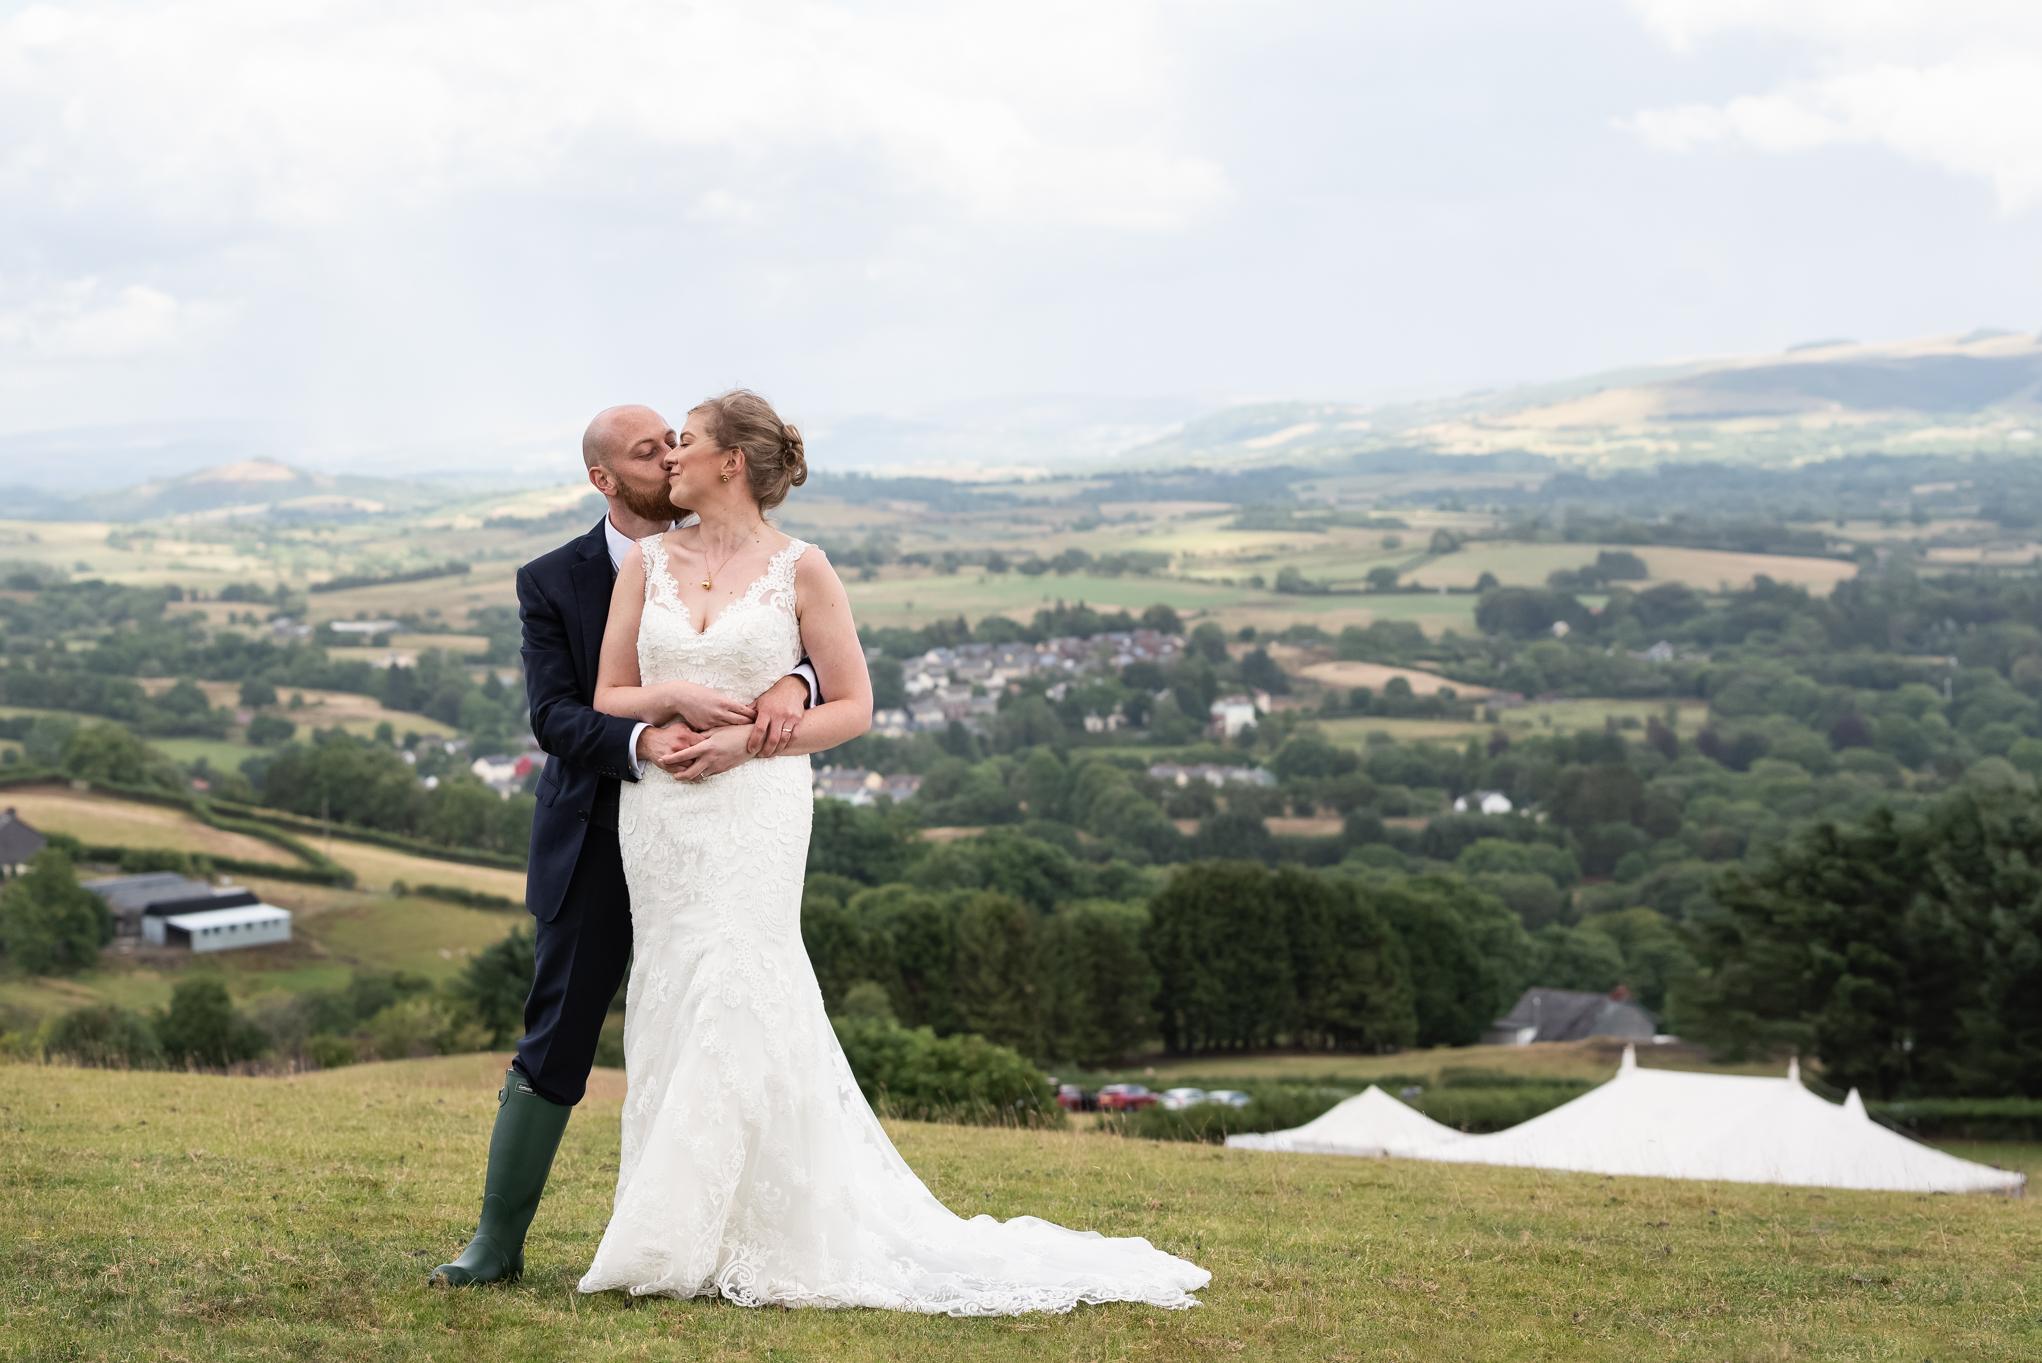 Wedding Bride & Groom - Powys Wedding Photography